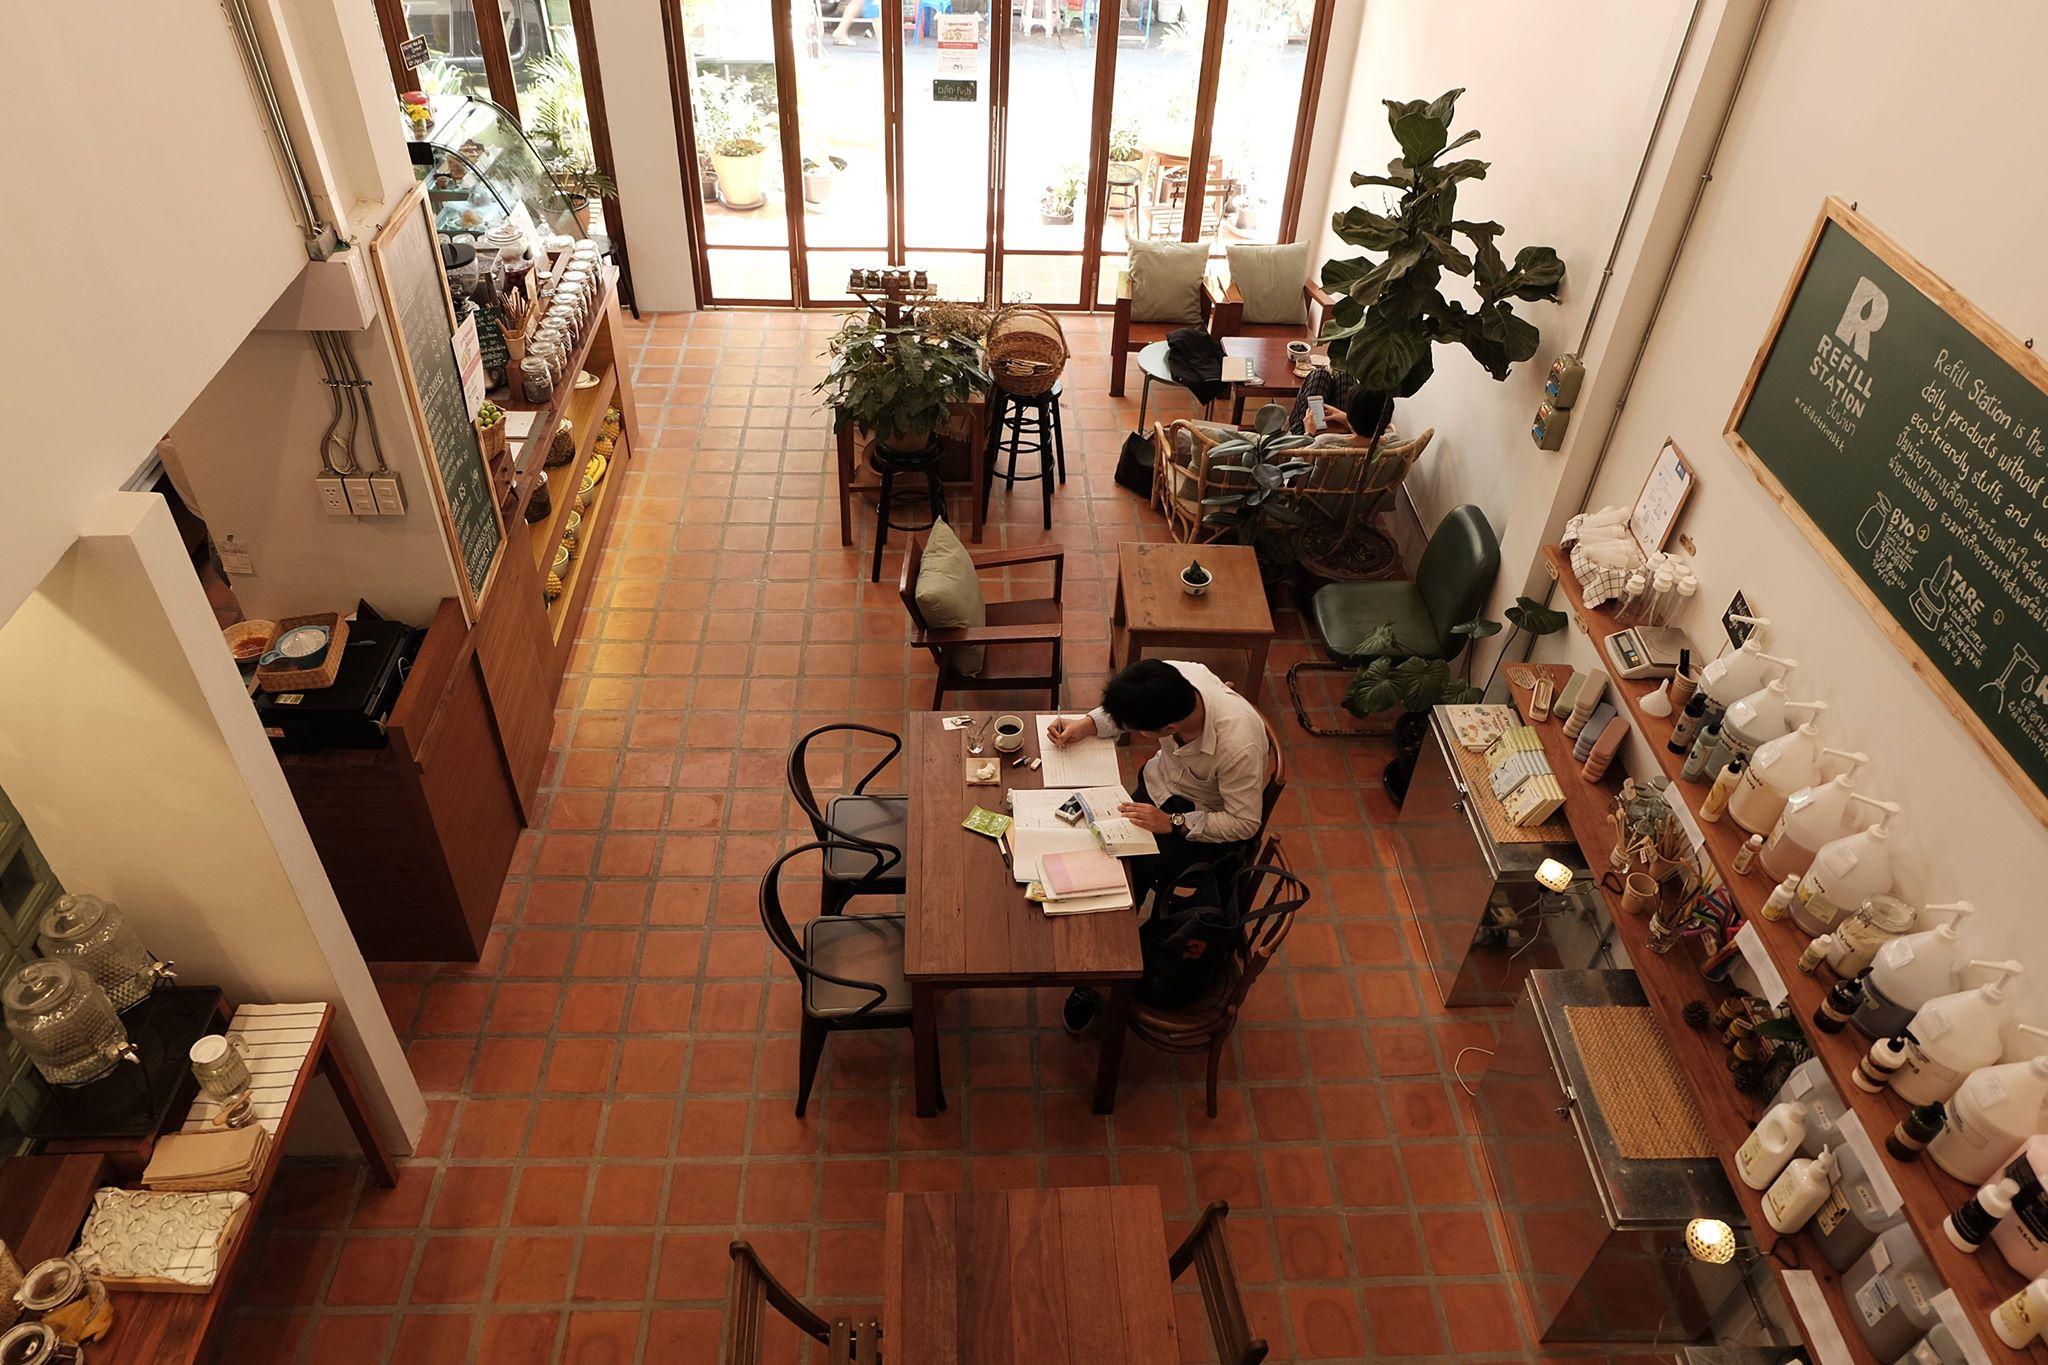 09-Enjoy our cozy eco-friendly cafe.jpg